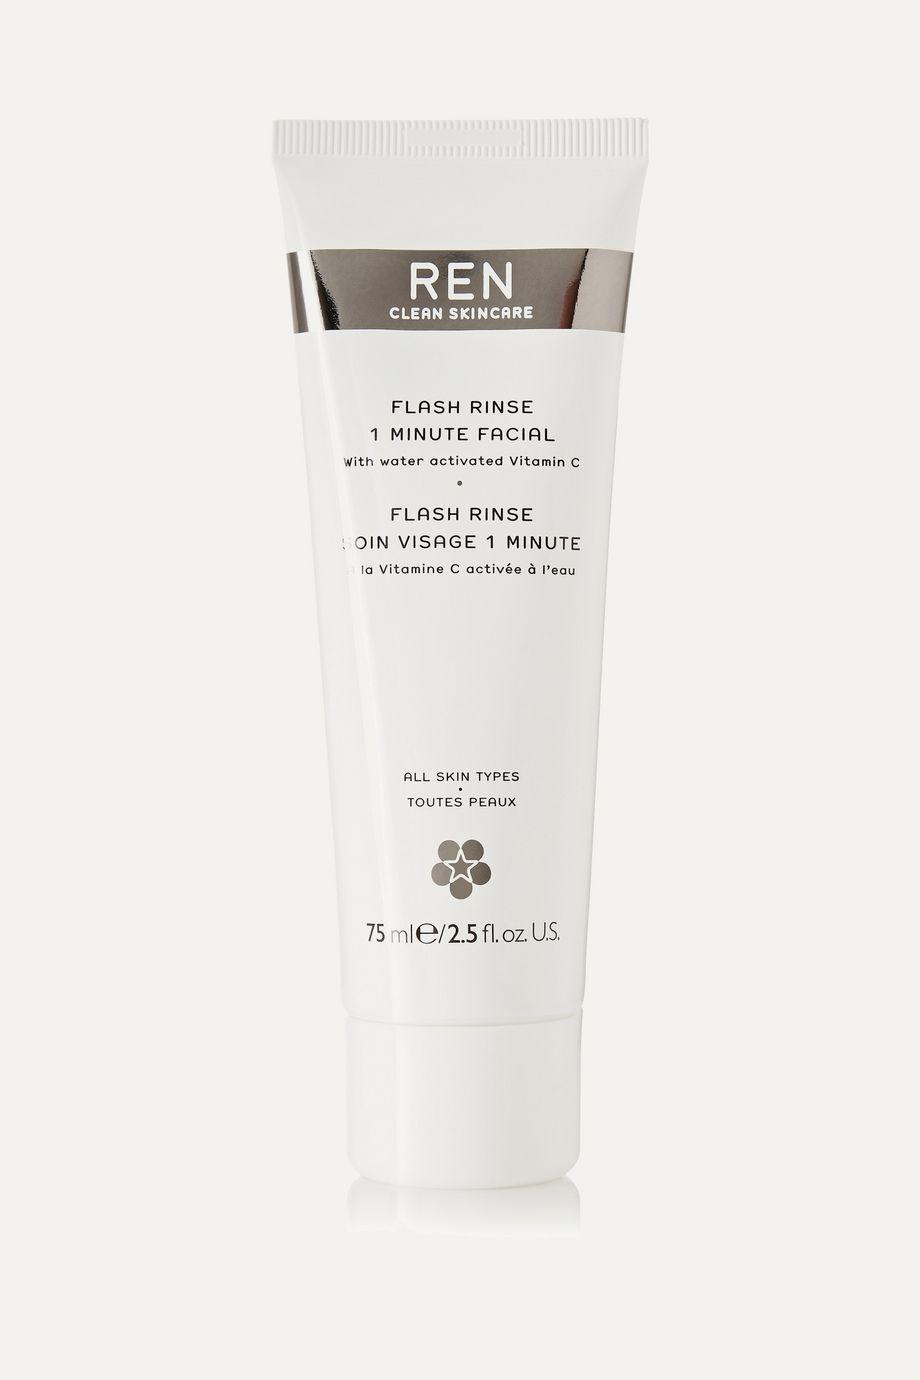 REN Clean Skincare Flash Rinse 1 Minute Facial, 75ml